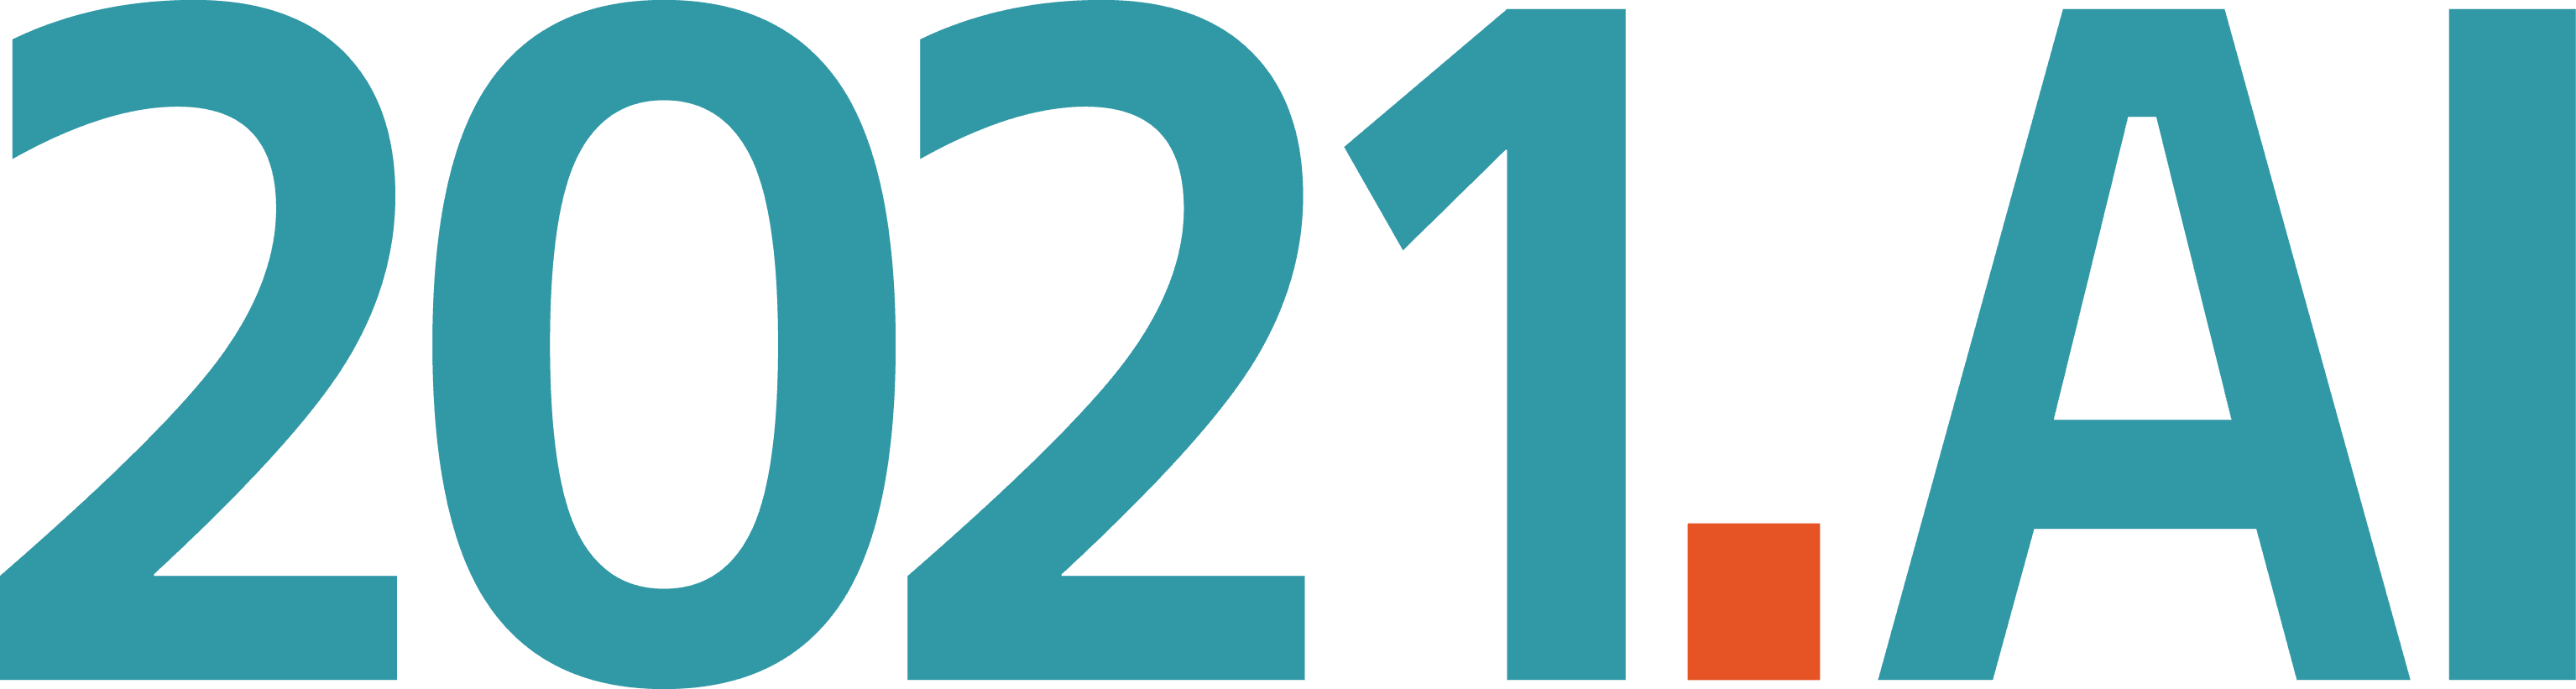 2021 ai, logo, artificial intelligence, ai, partner